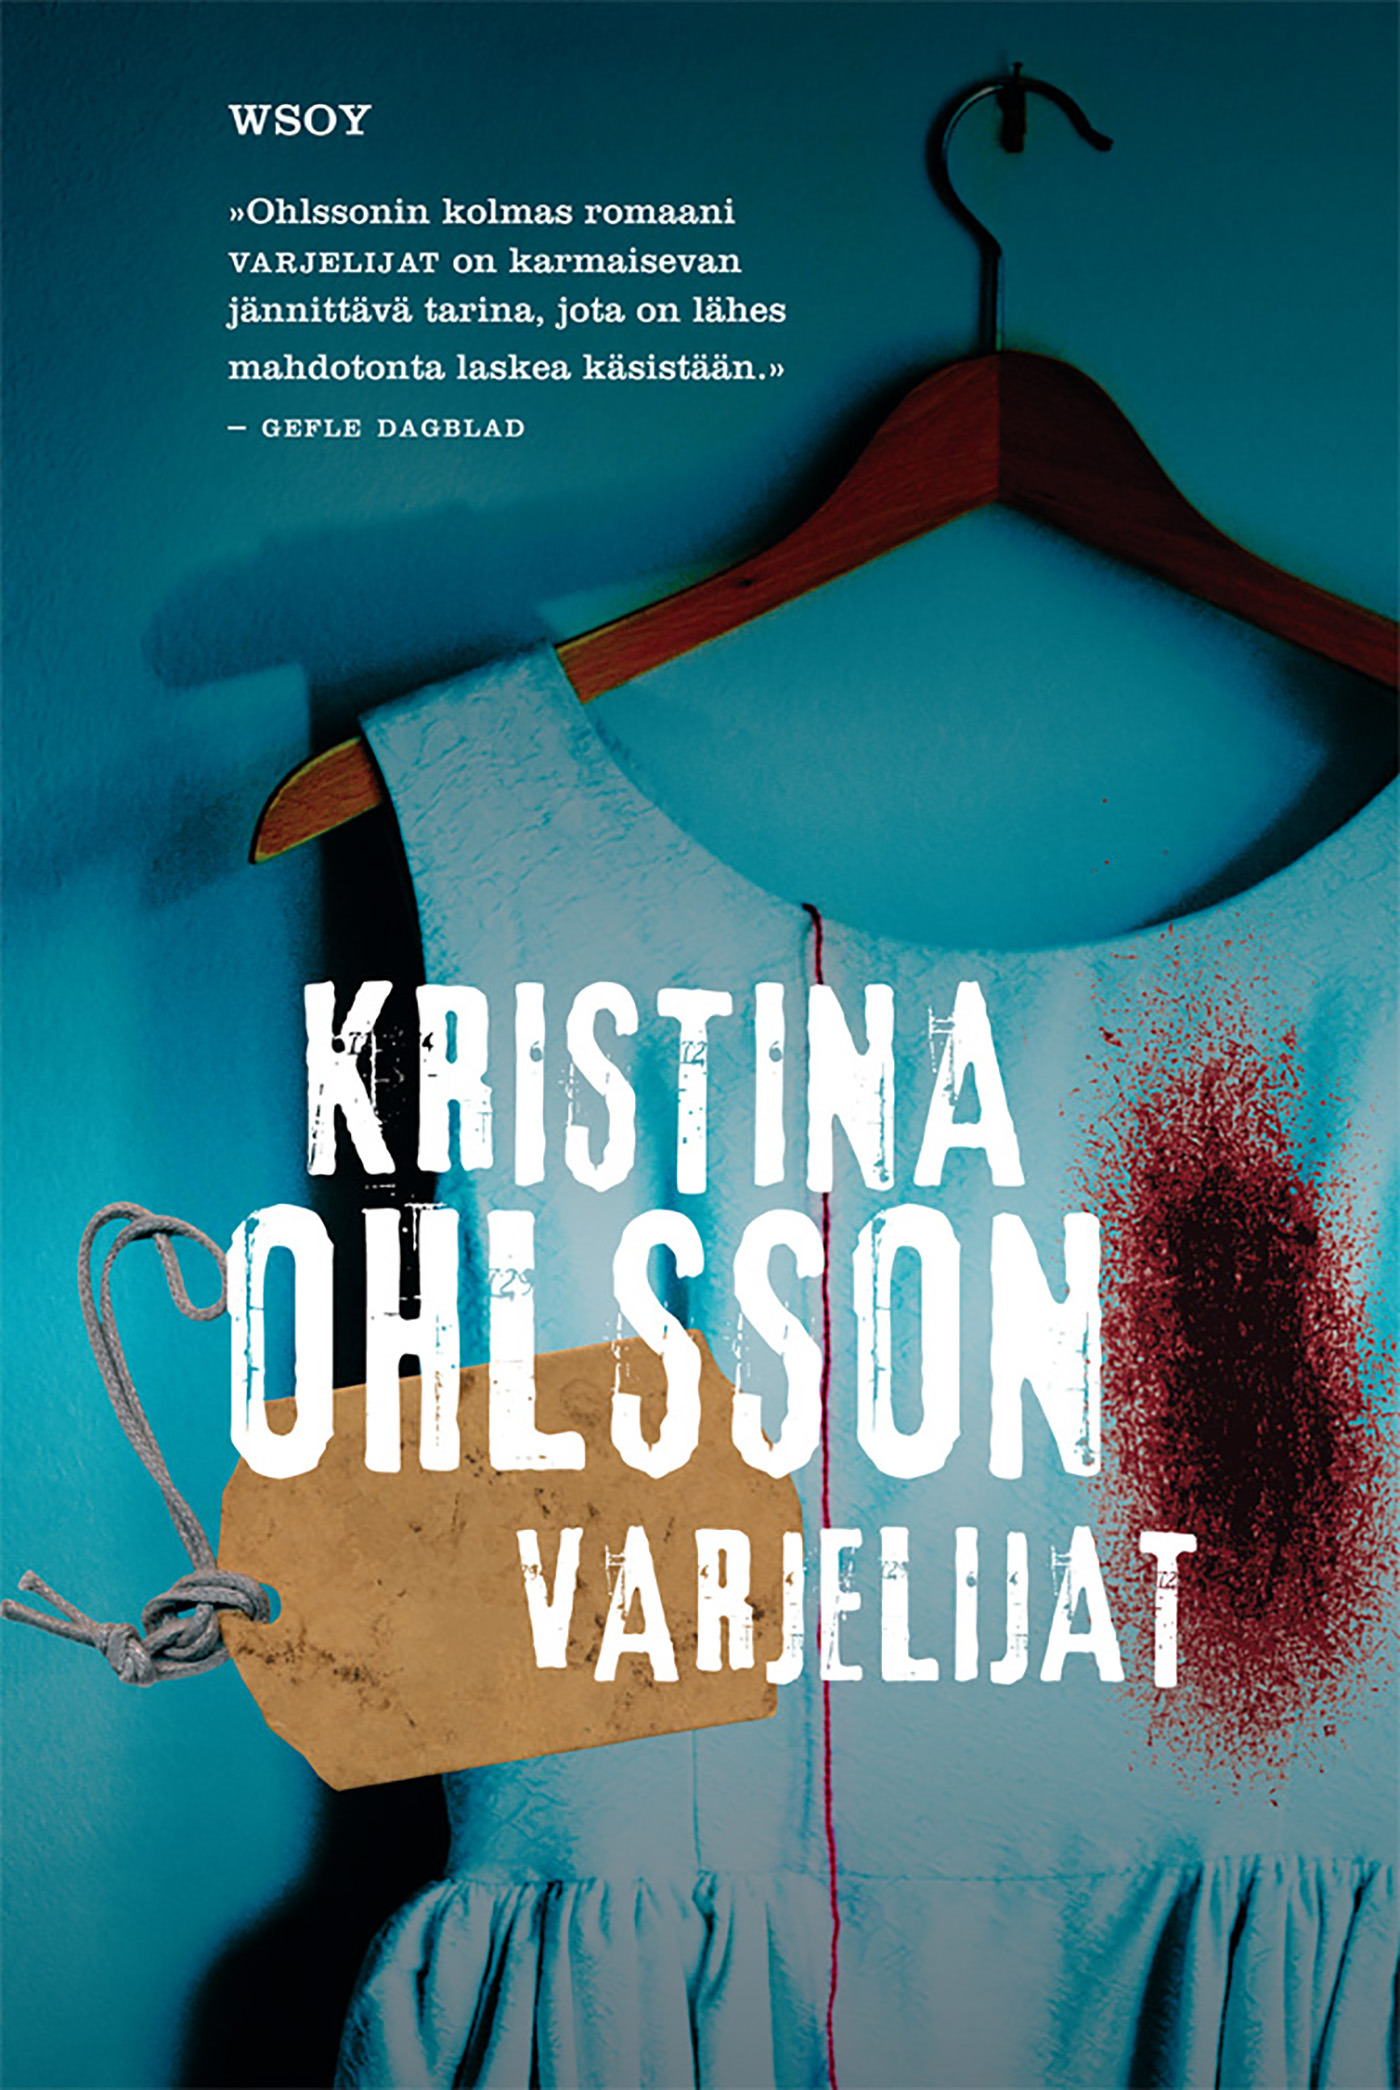 Ohlsson, Kristina - Varjelijat, ebook